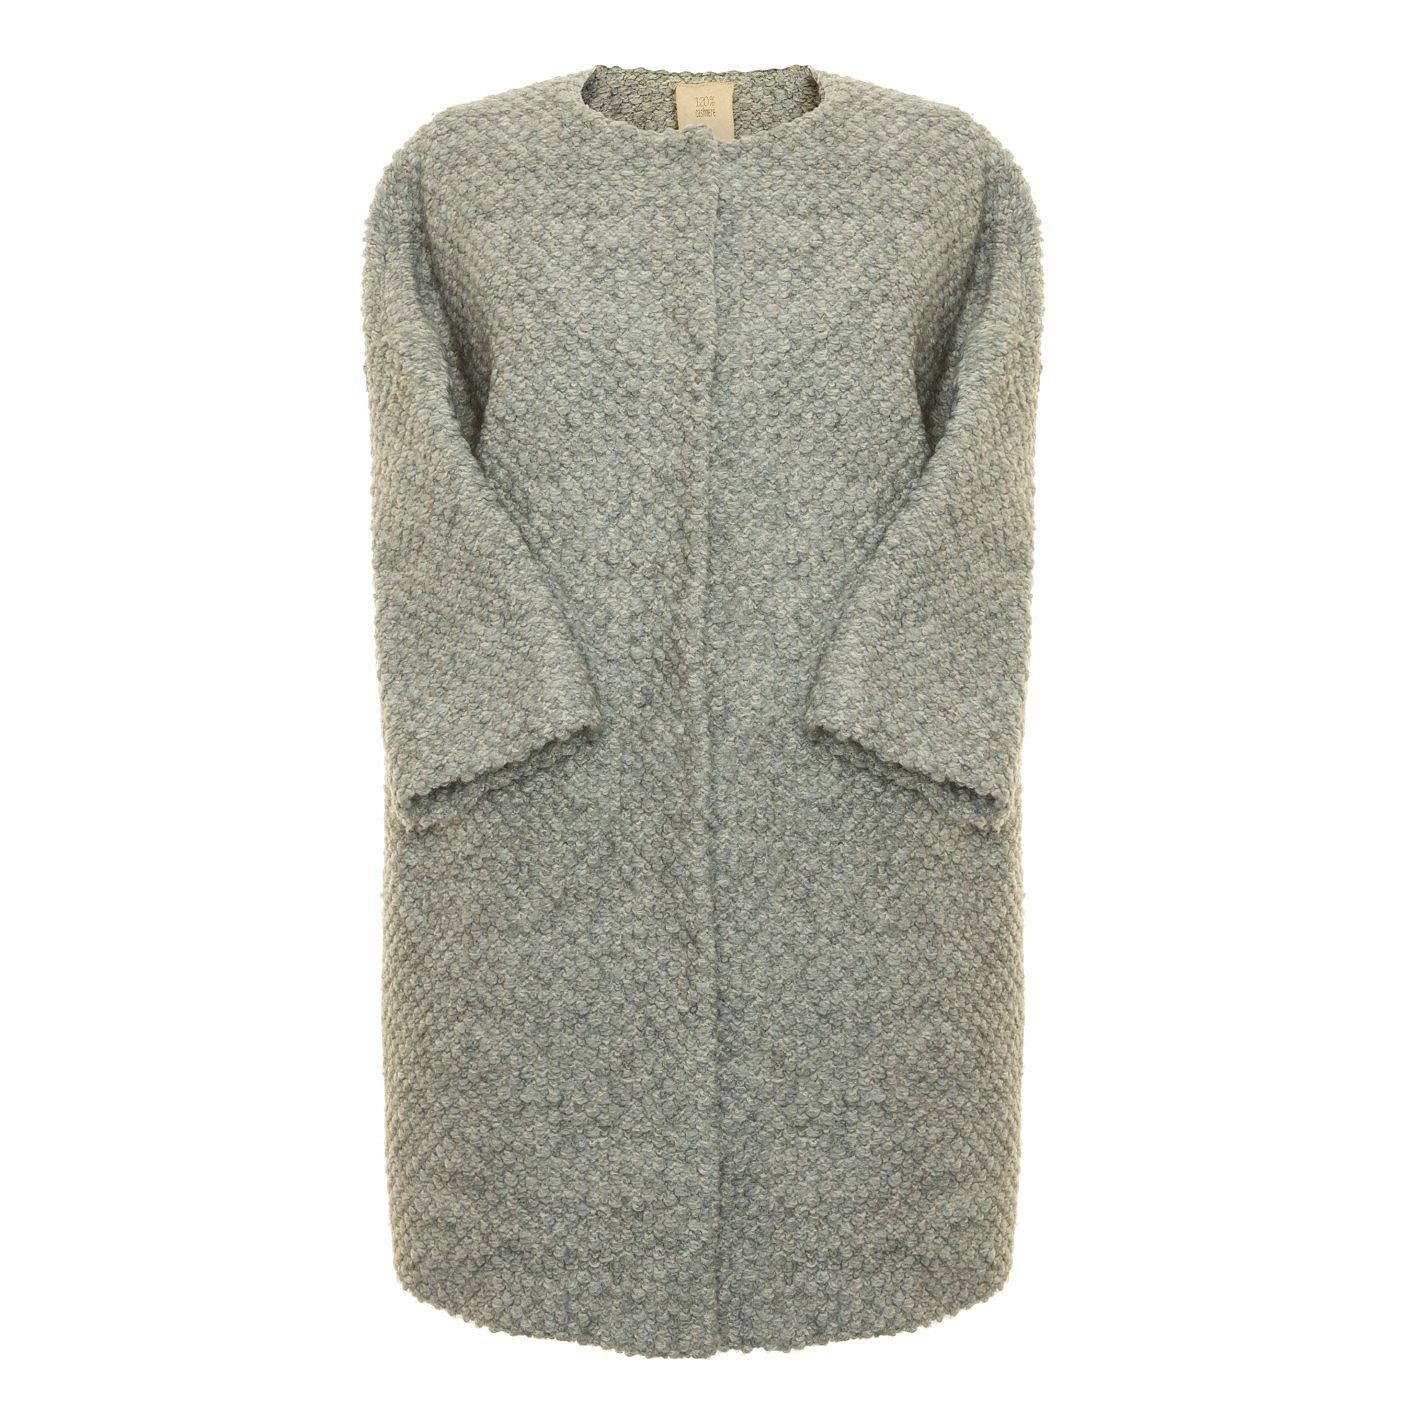 Palladium Cashmere Knit Jacket